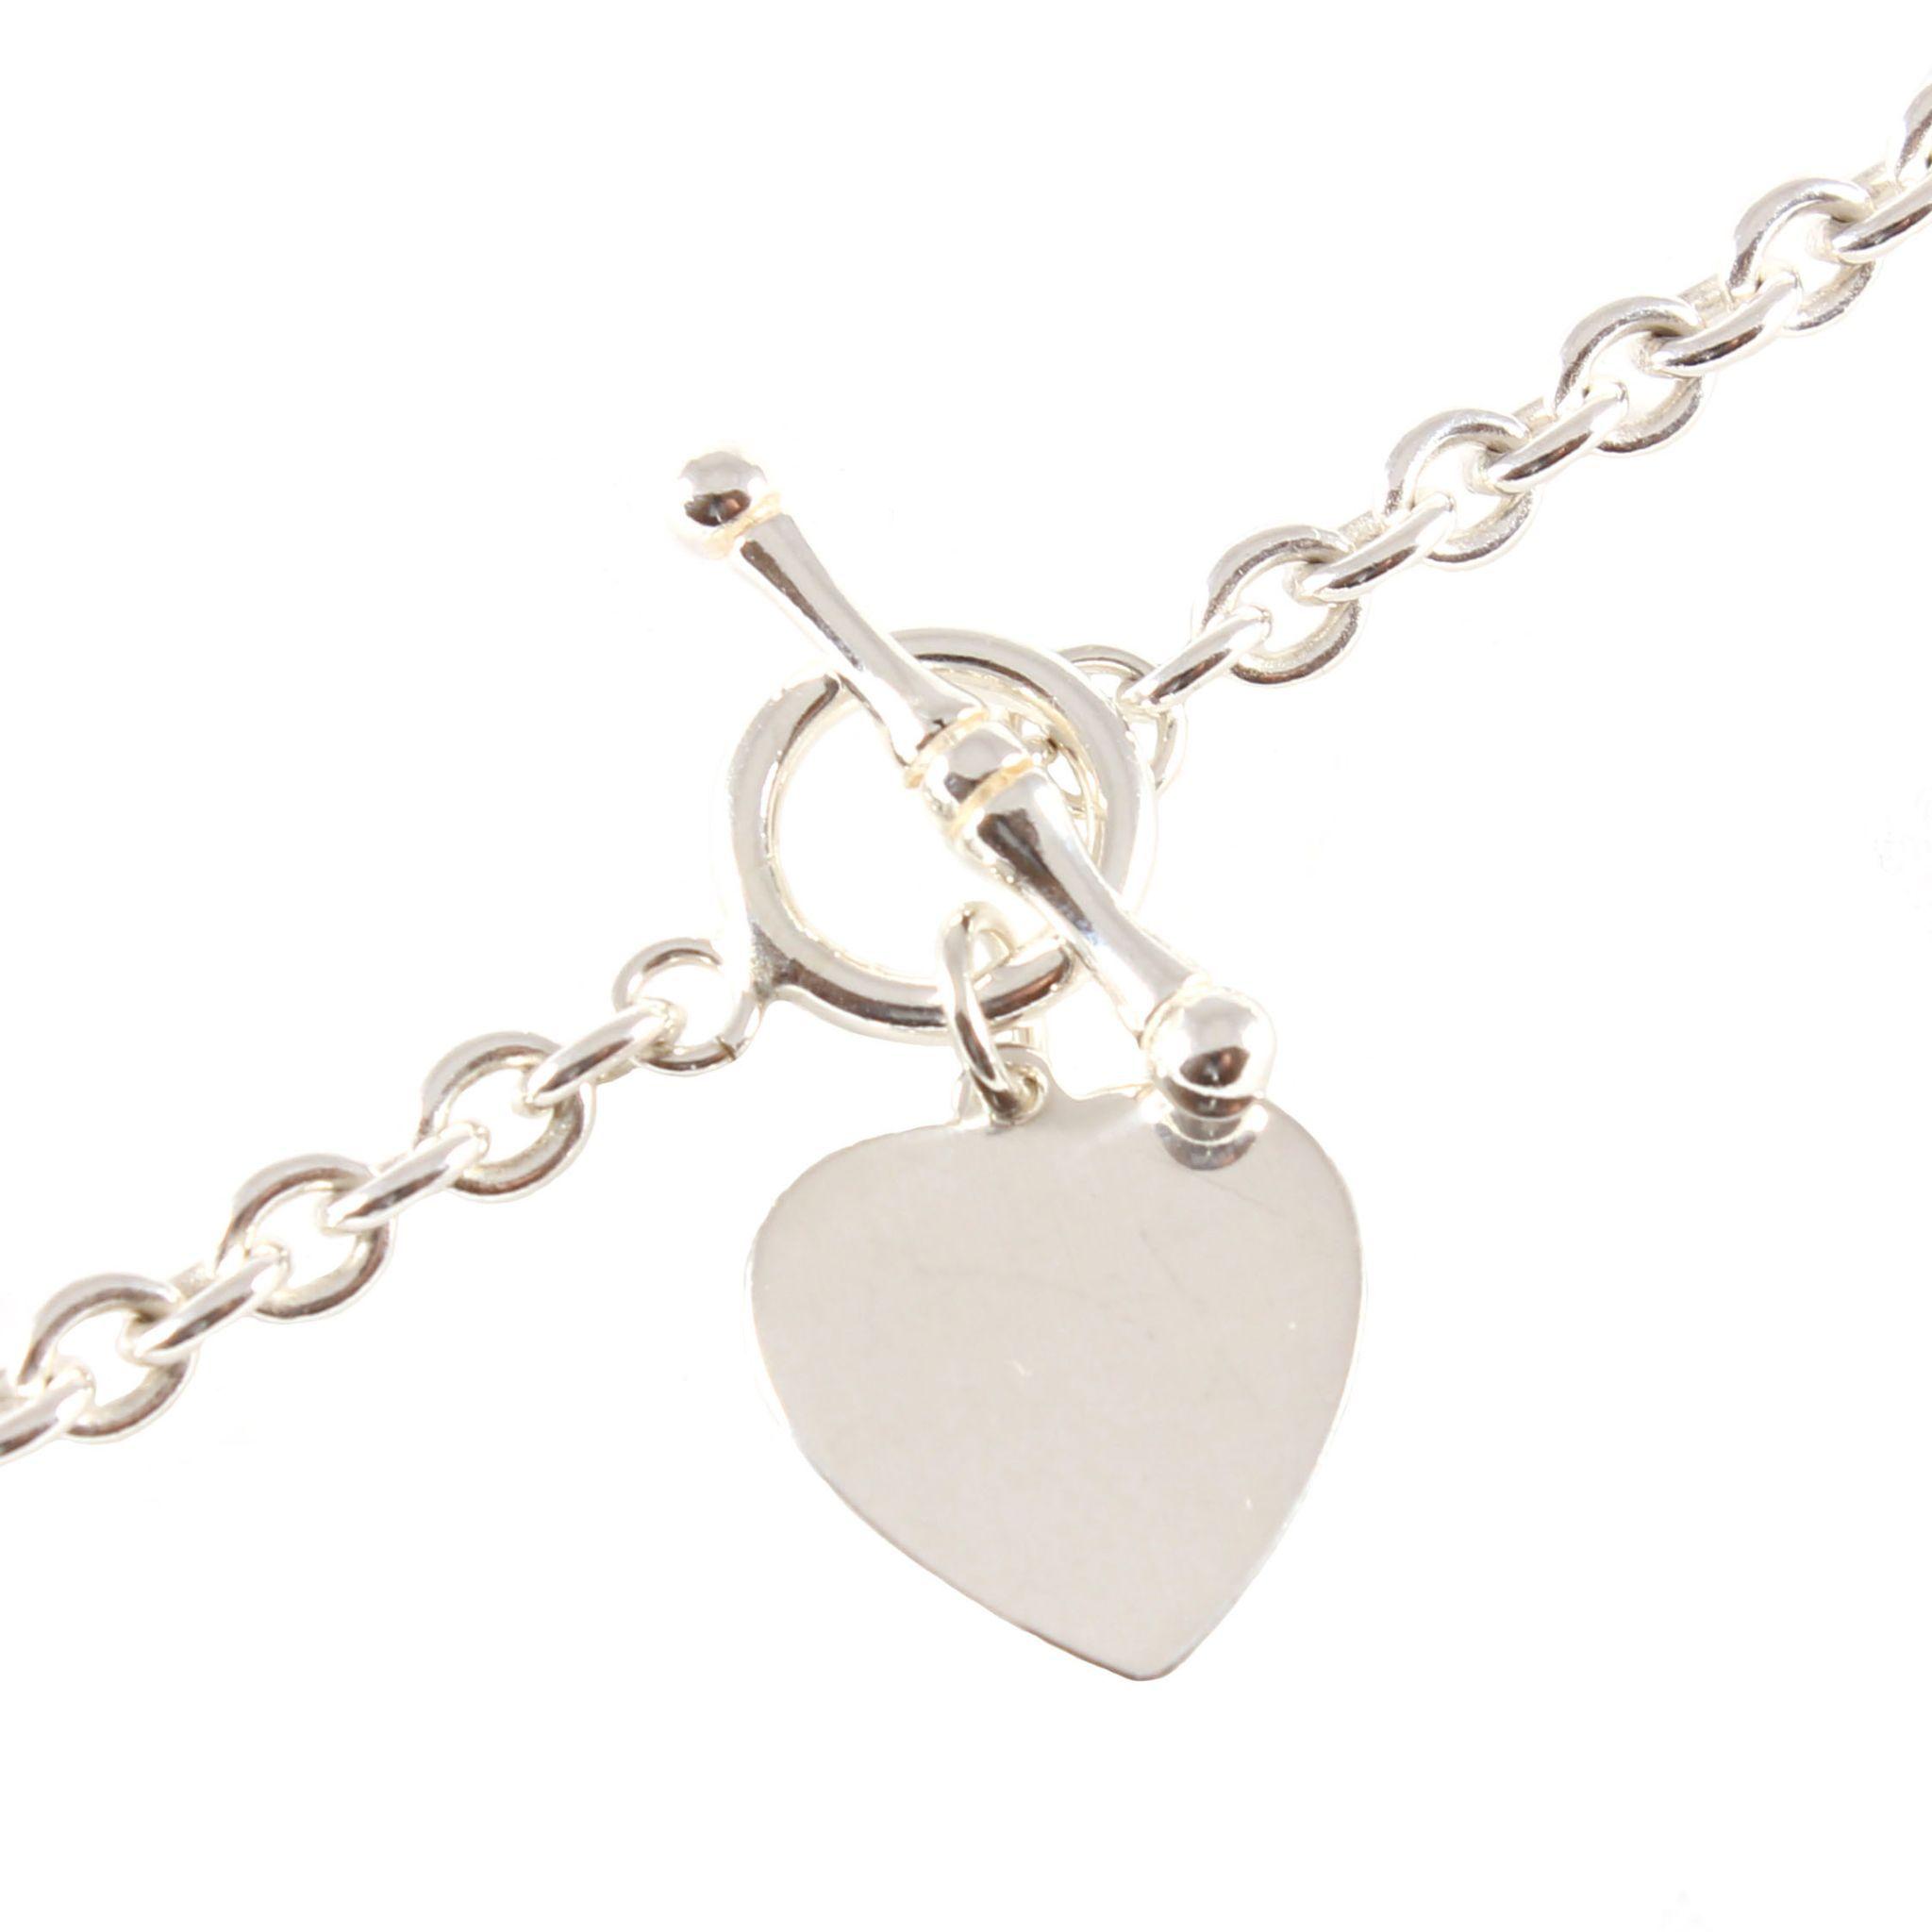 personalised sterling silver charm bracelet best